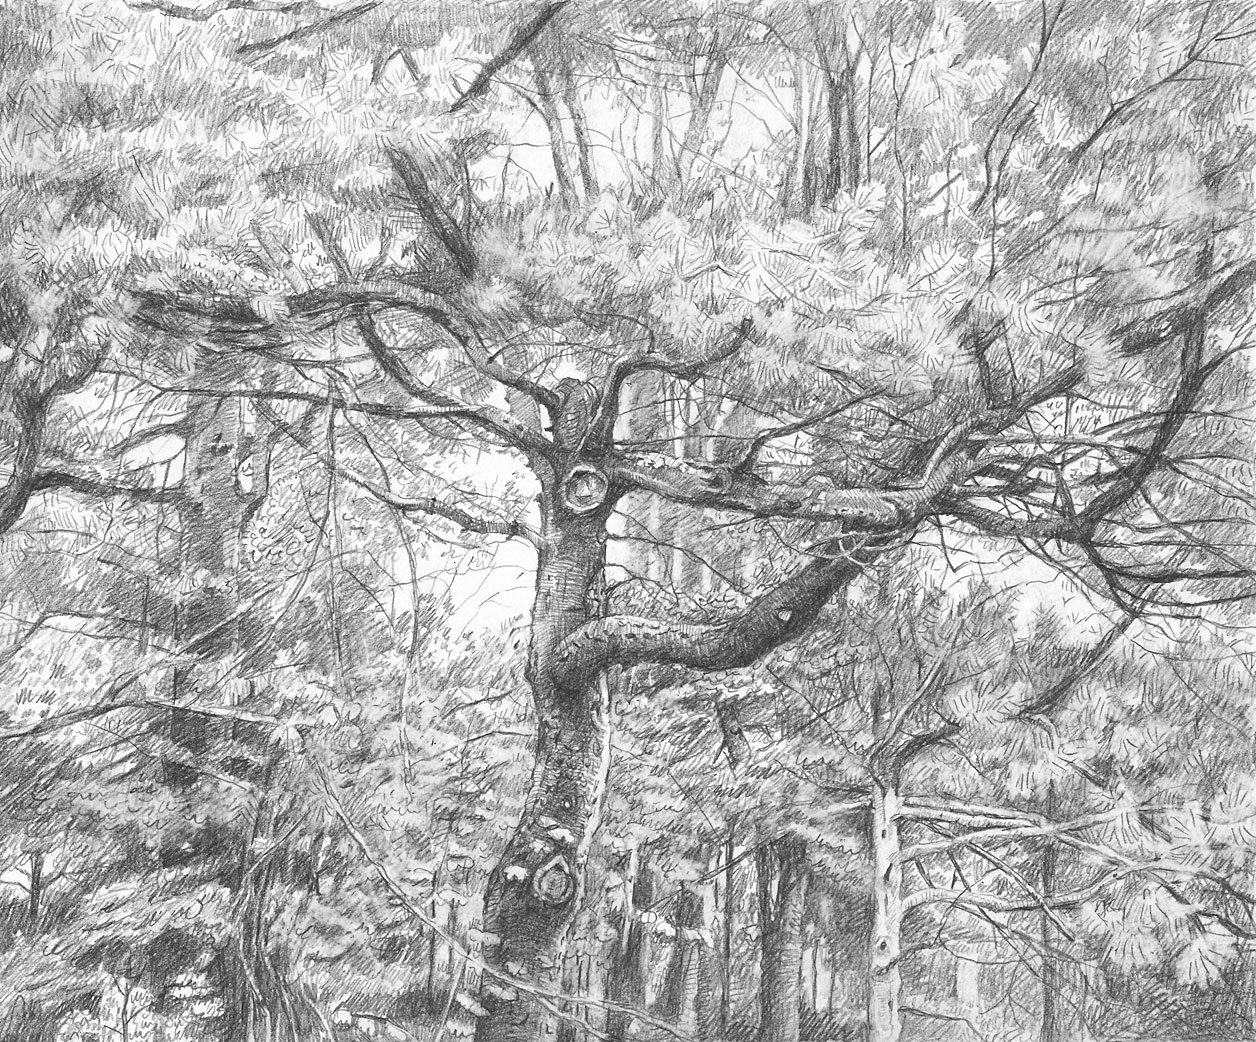 Pruned Pine